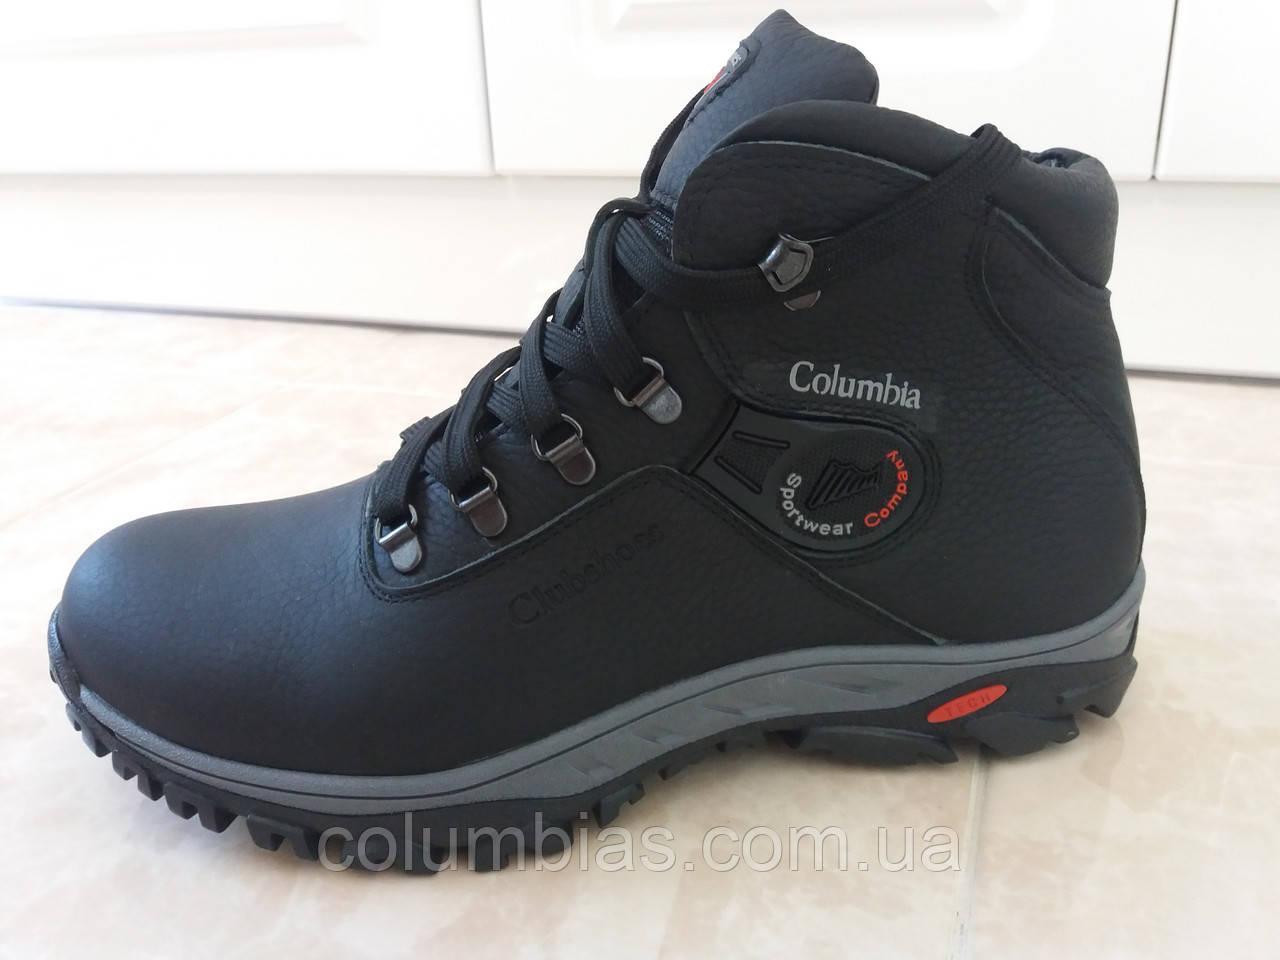 Зимние кожаные ботинки Columbiaa